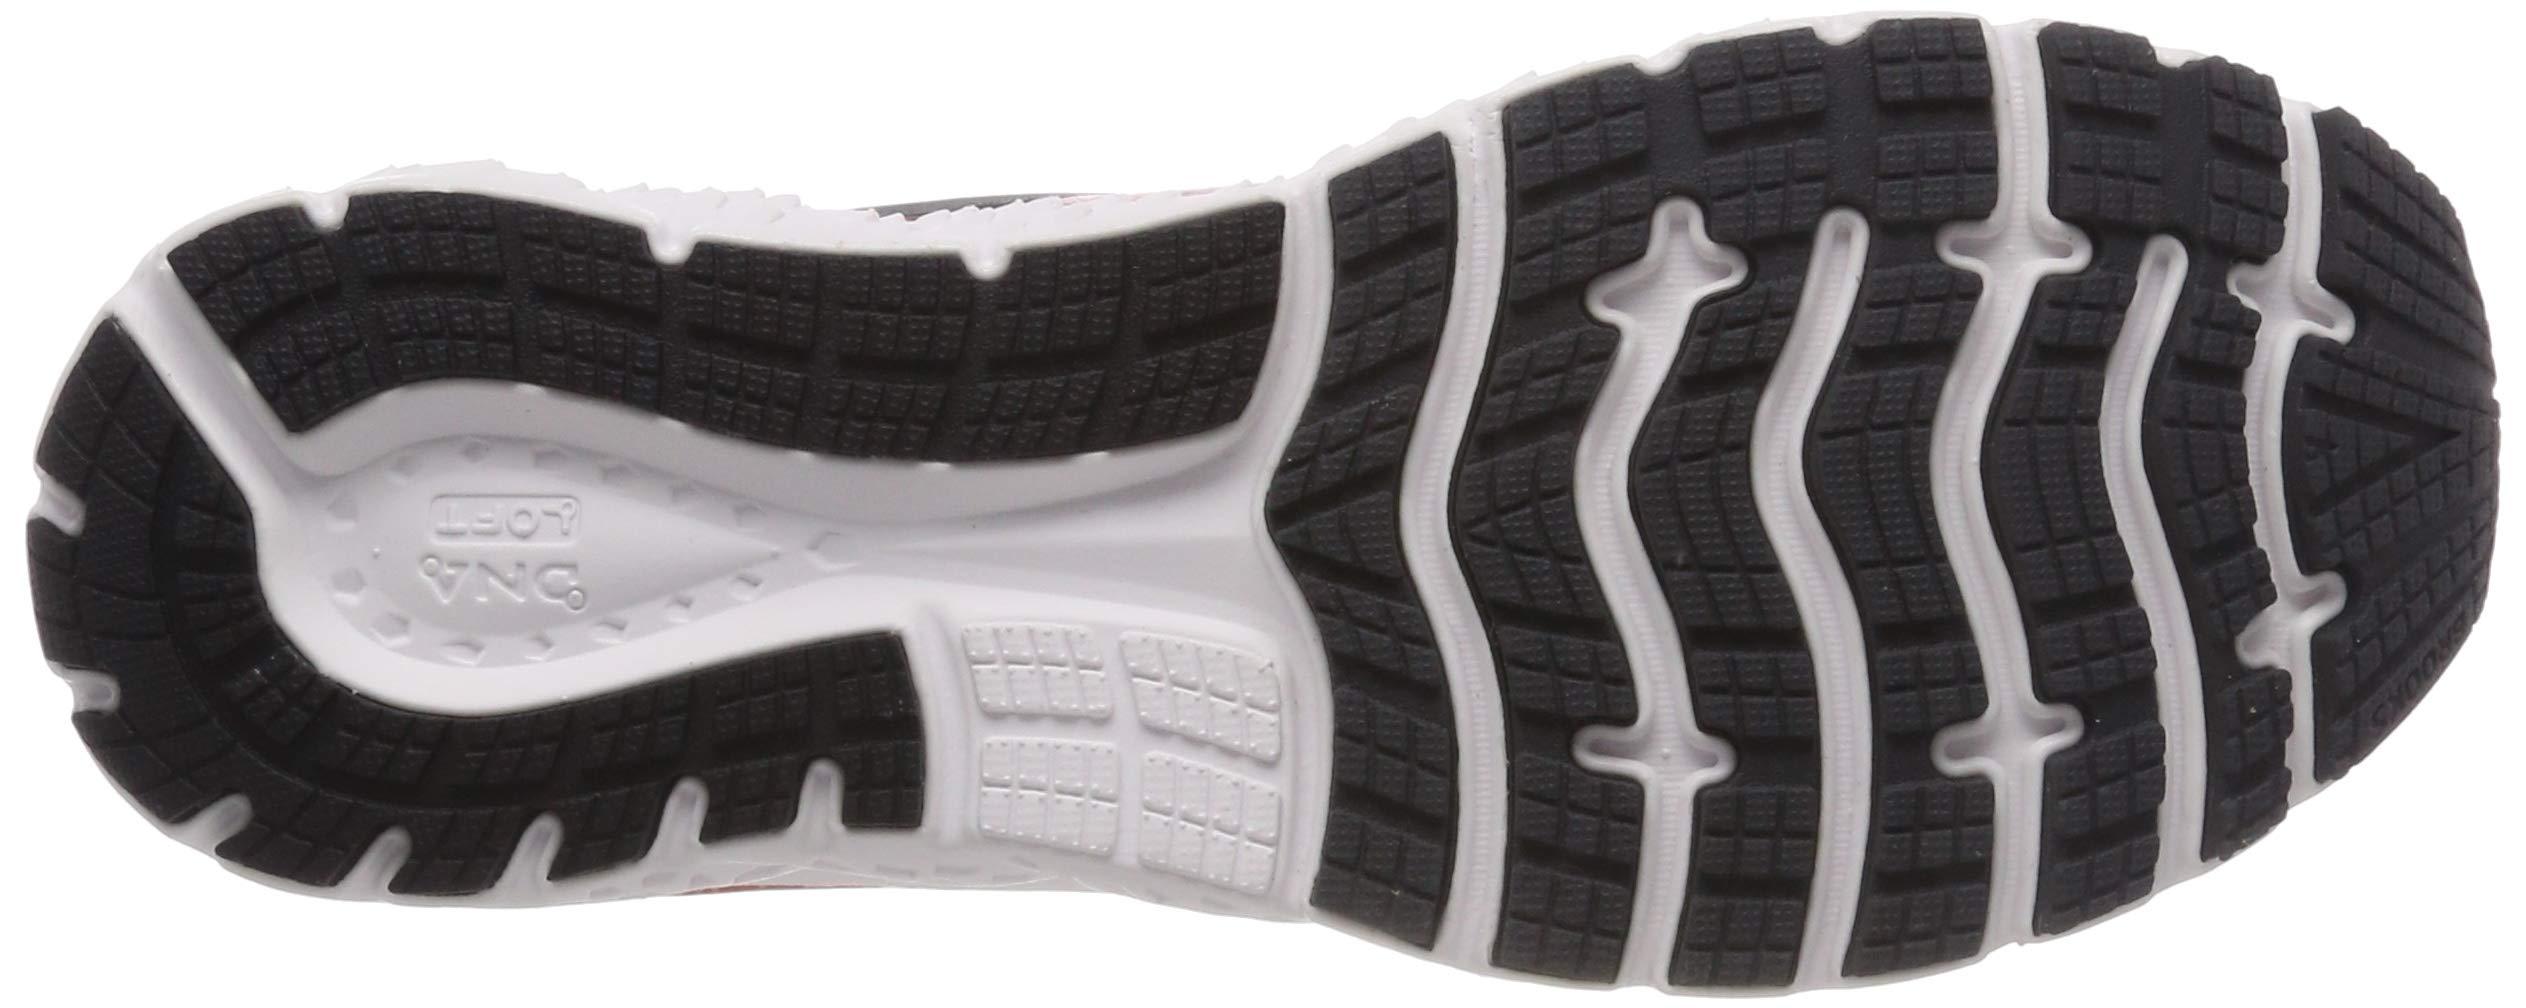 719Vbs7eHtL - Brooks Men's Glycerin 16 Running Shoes